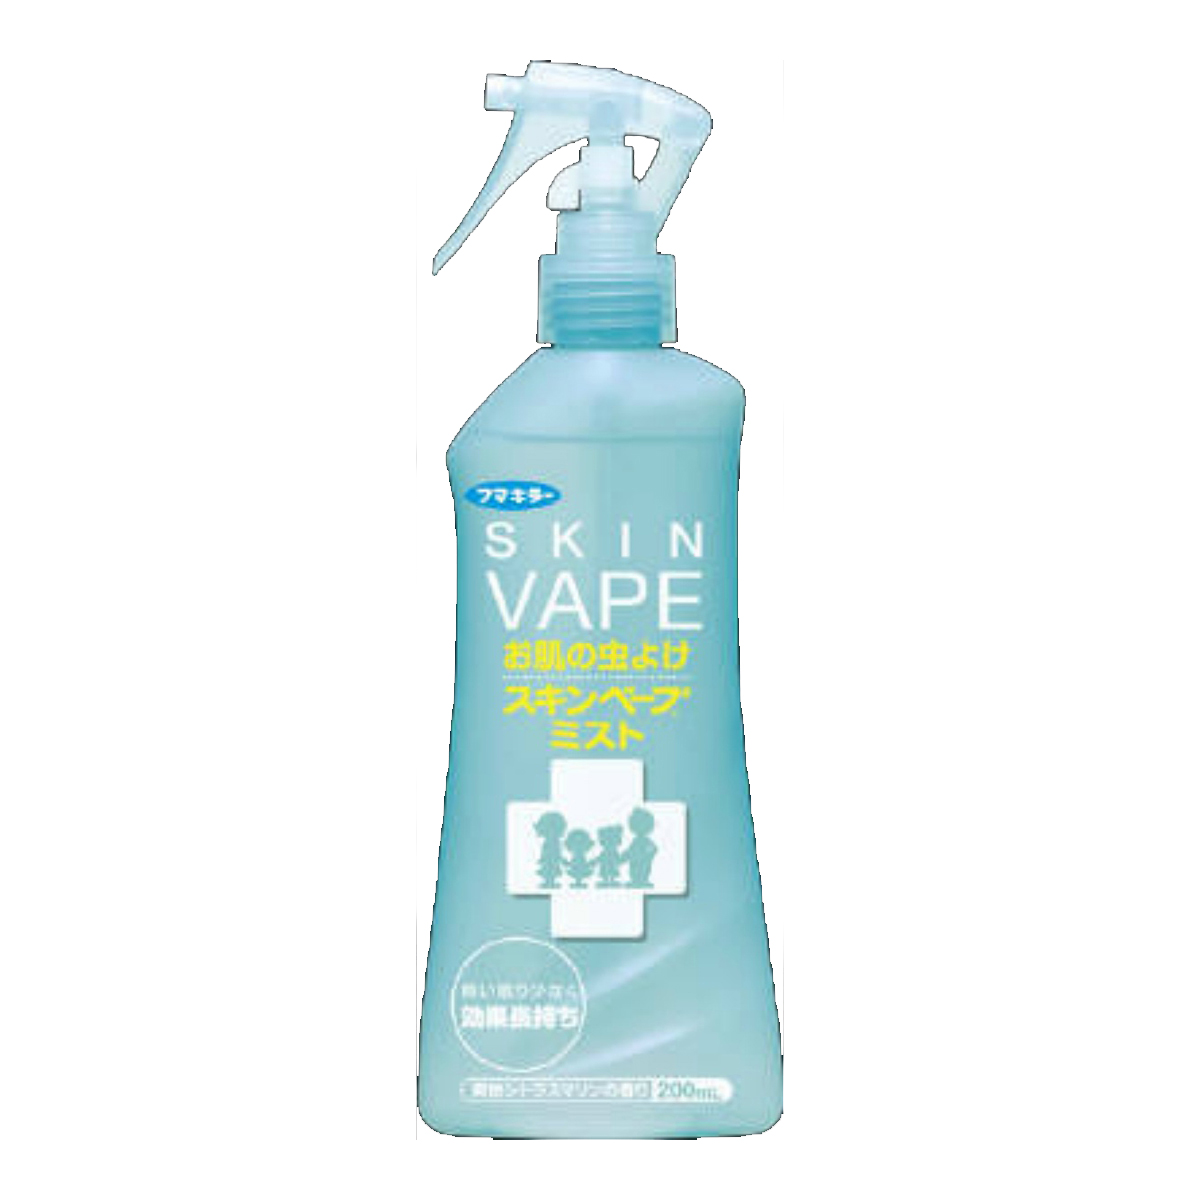 Fumakilla SKIN VAPE Spray  nonpharmaceutical Mosquito repellent product Large Volume Elegant citrus fragrance (4902424433050)